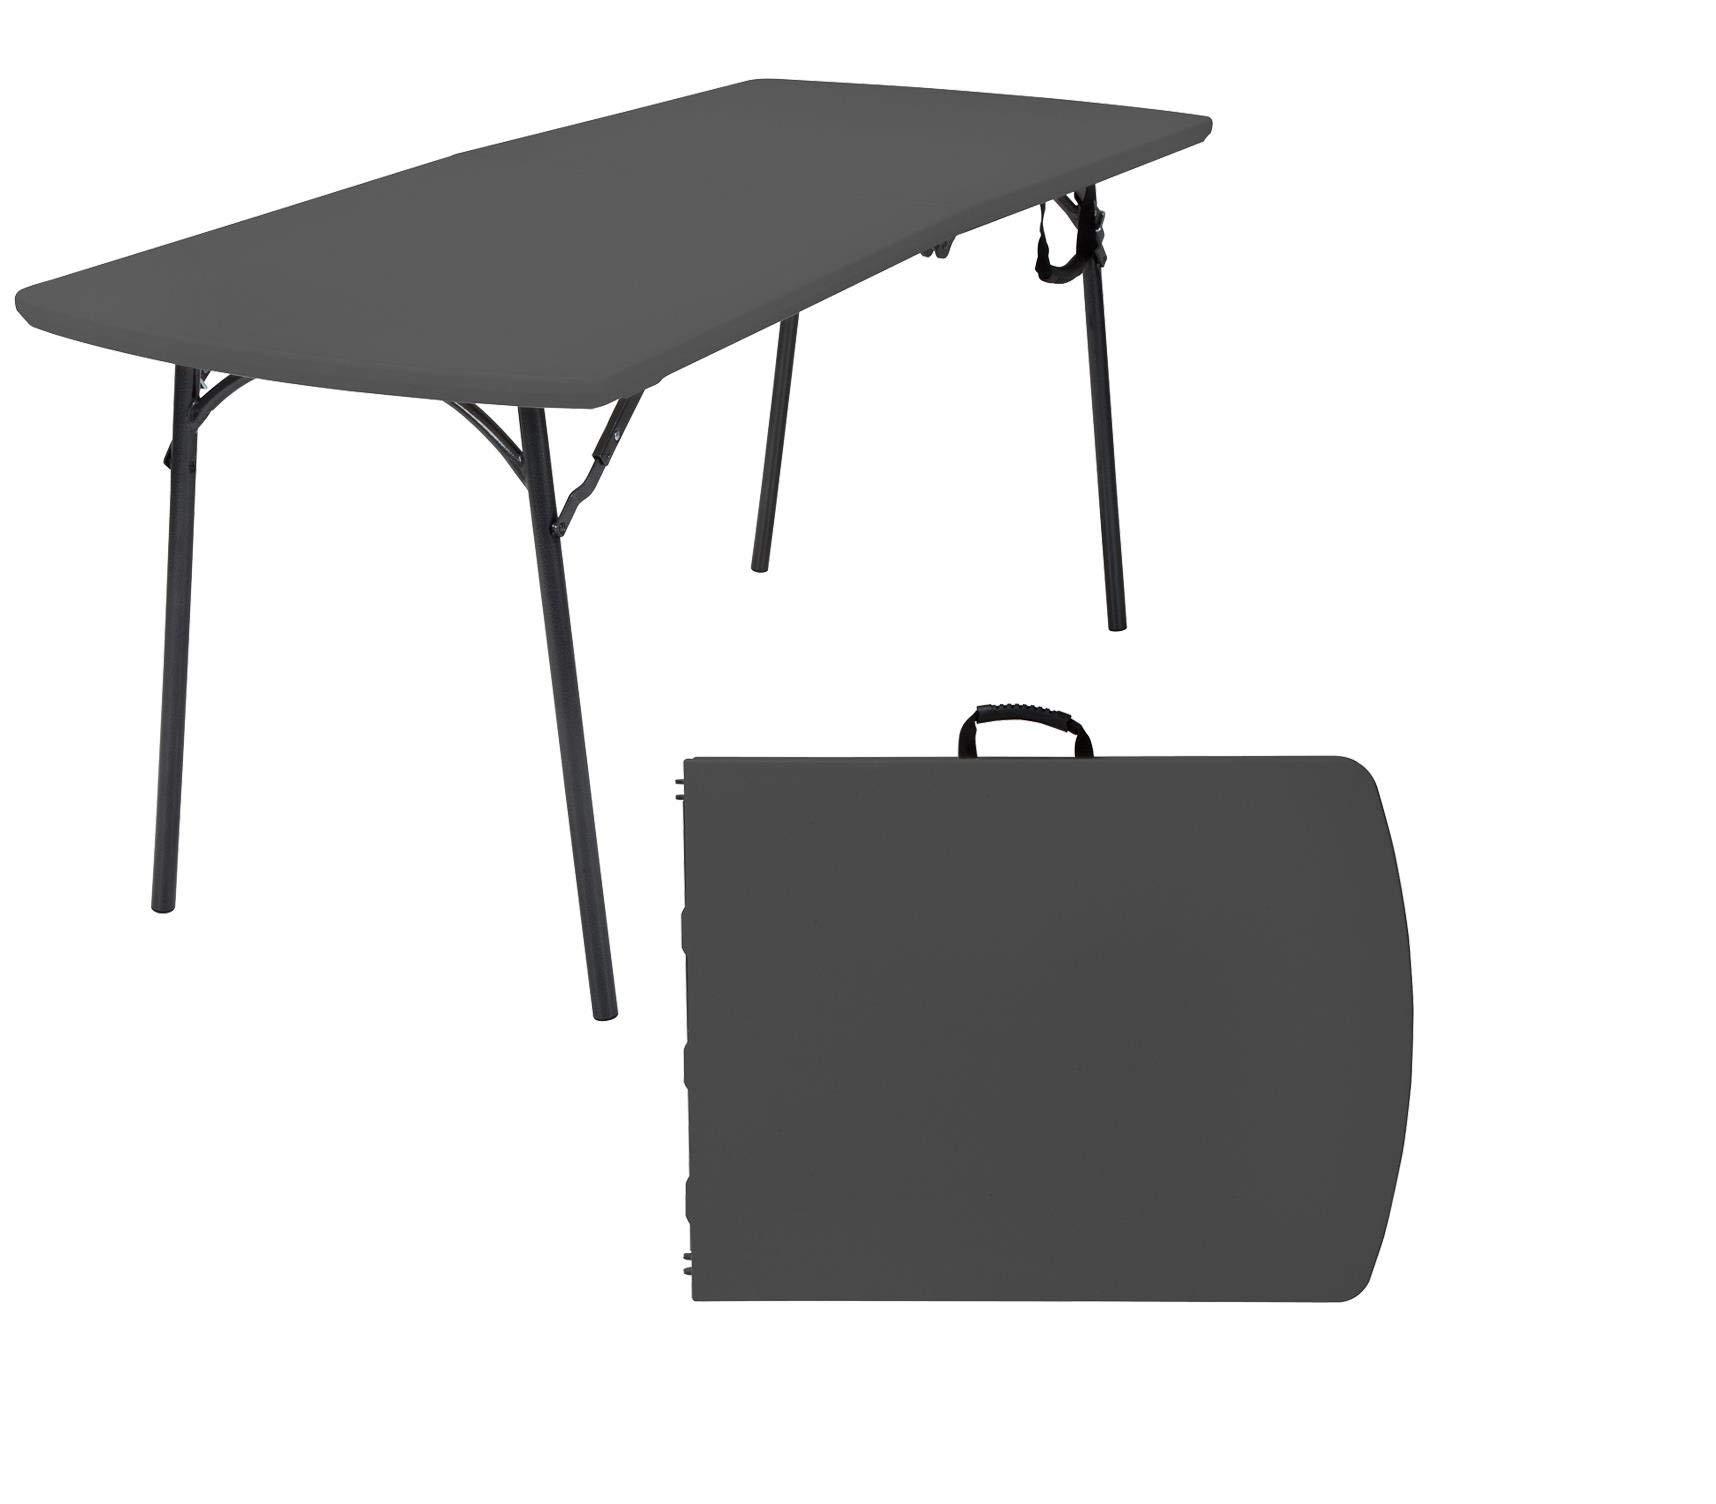 COSCO Diamond Series Banquet Table, 6 x 30, Black (Renewed)